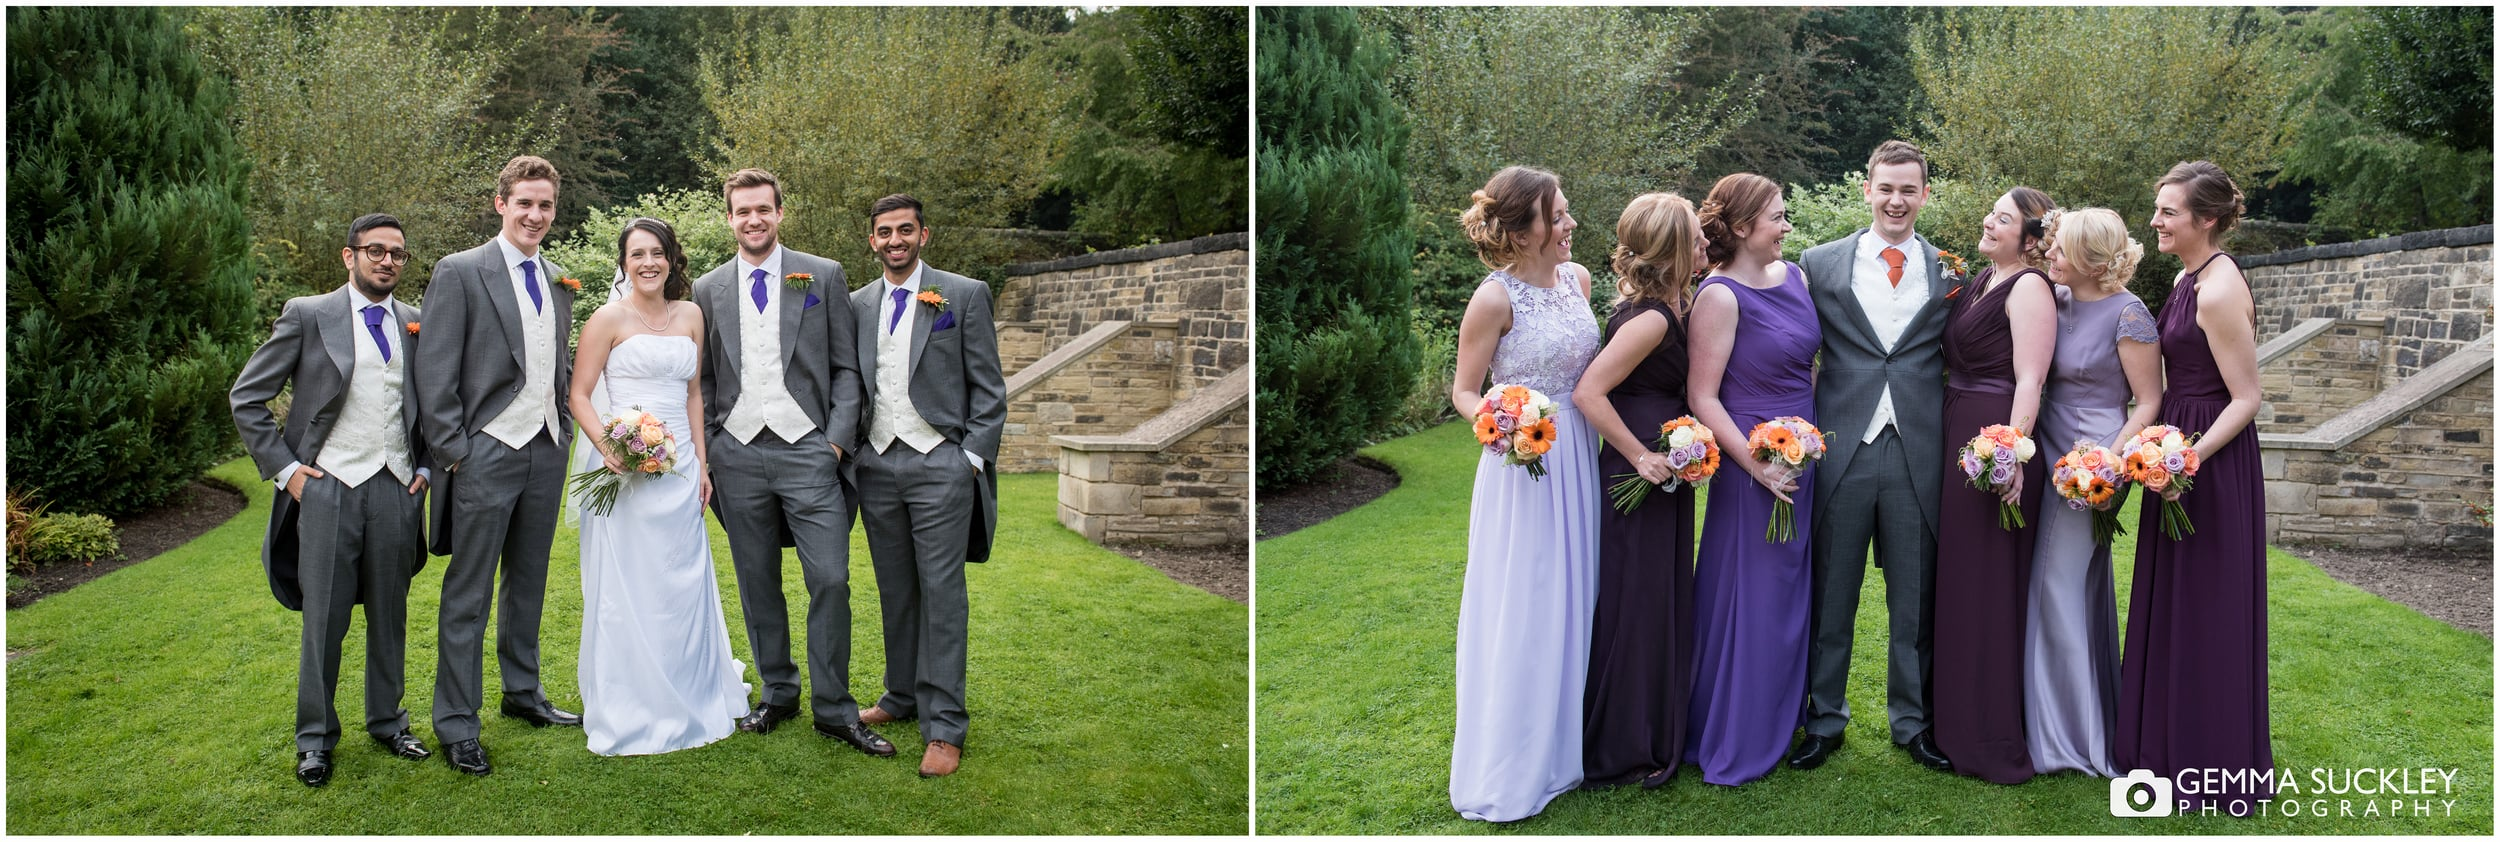 bridal-formals-hoyle-court.jpg